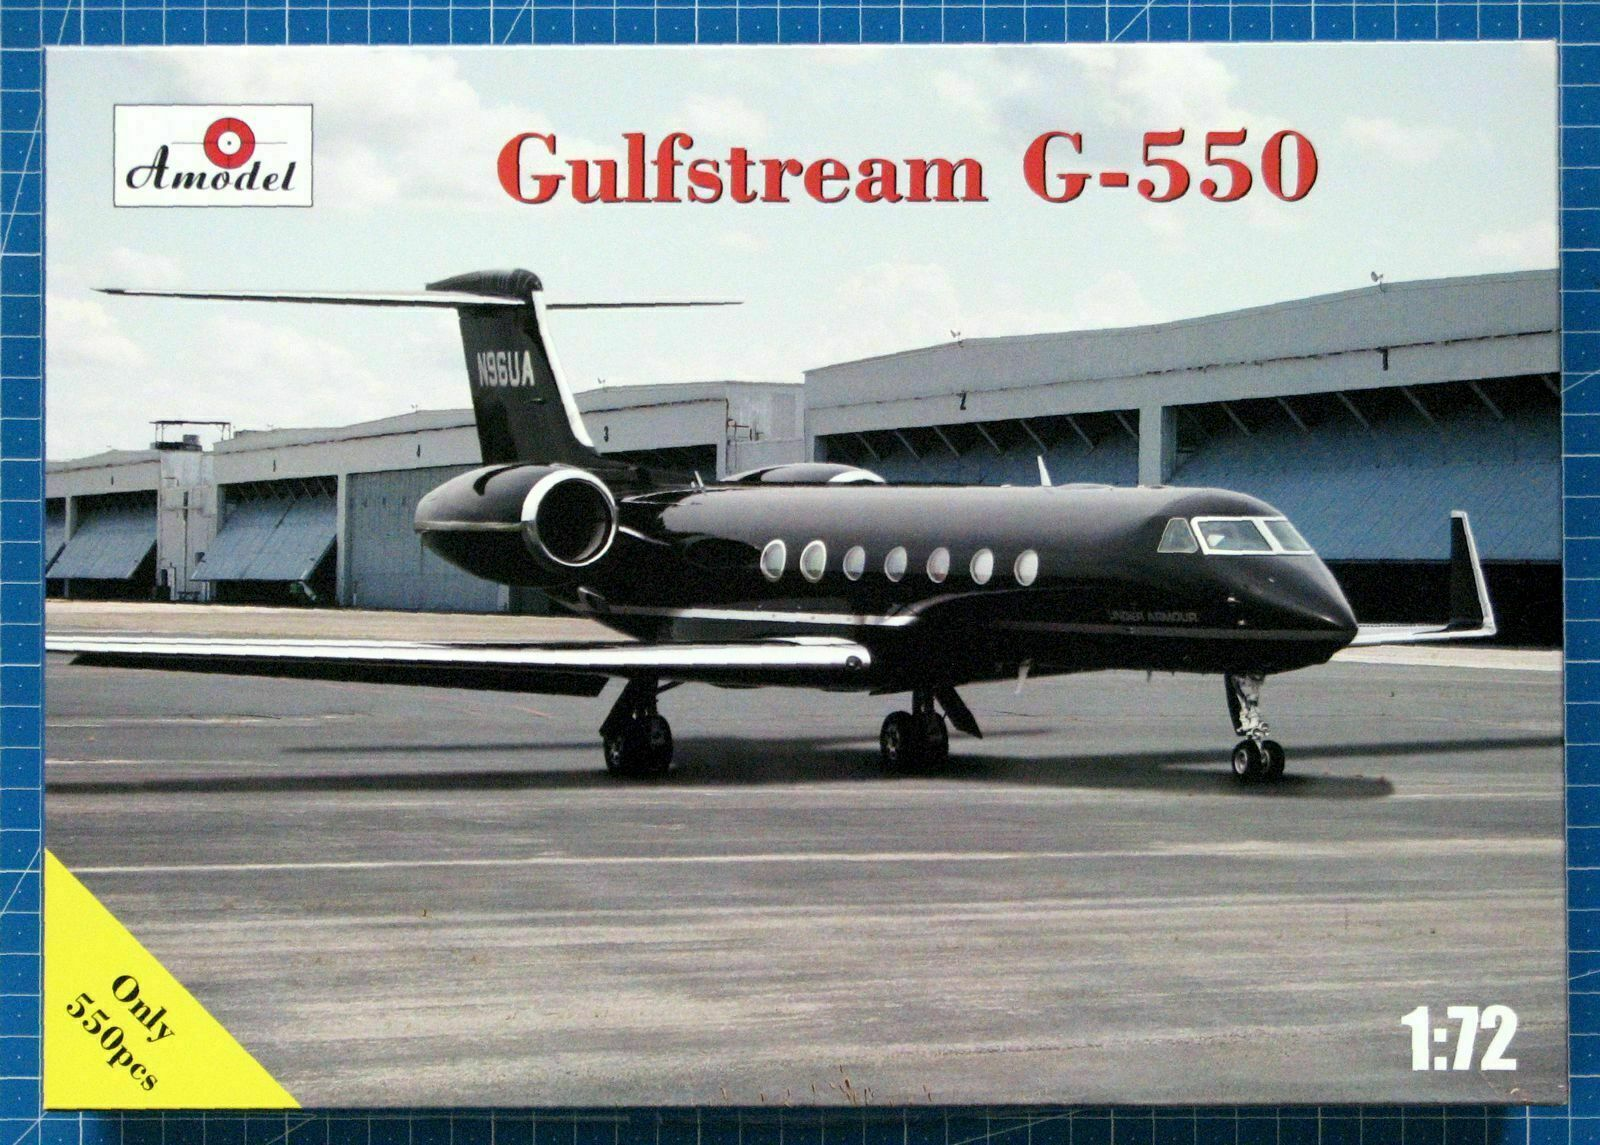 Amodel 72361 - 1 72 Gulfstream G-550 Business Class Airplane, scale model kit